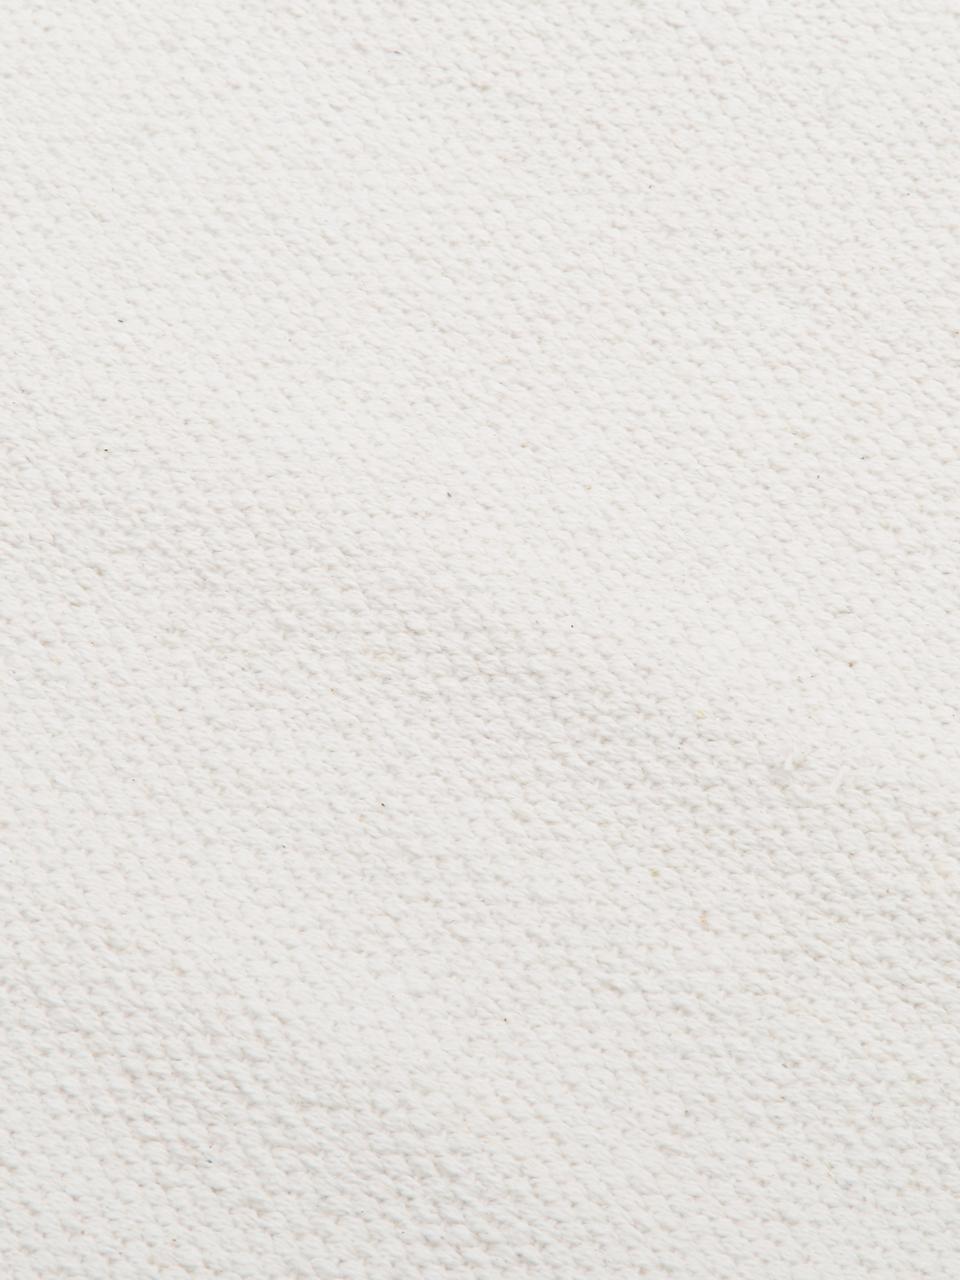 Dun handgeweven katoenen vloerkleed Agneta, Katoen, Crèmewit, B 200 x L 300 cm (maat L)